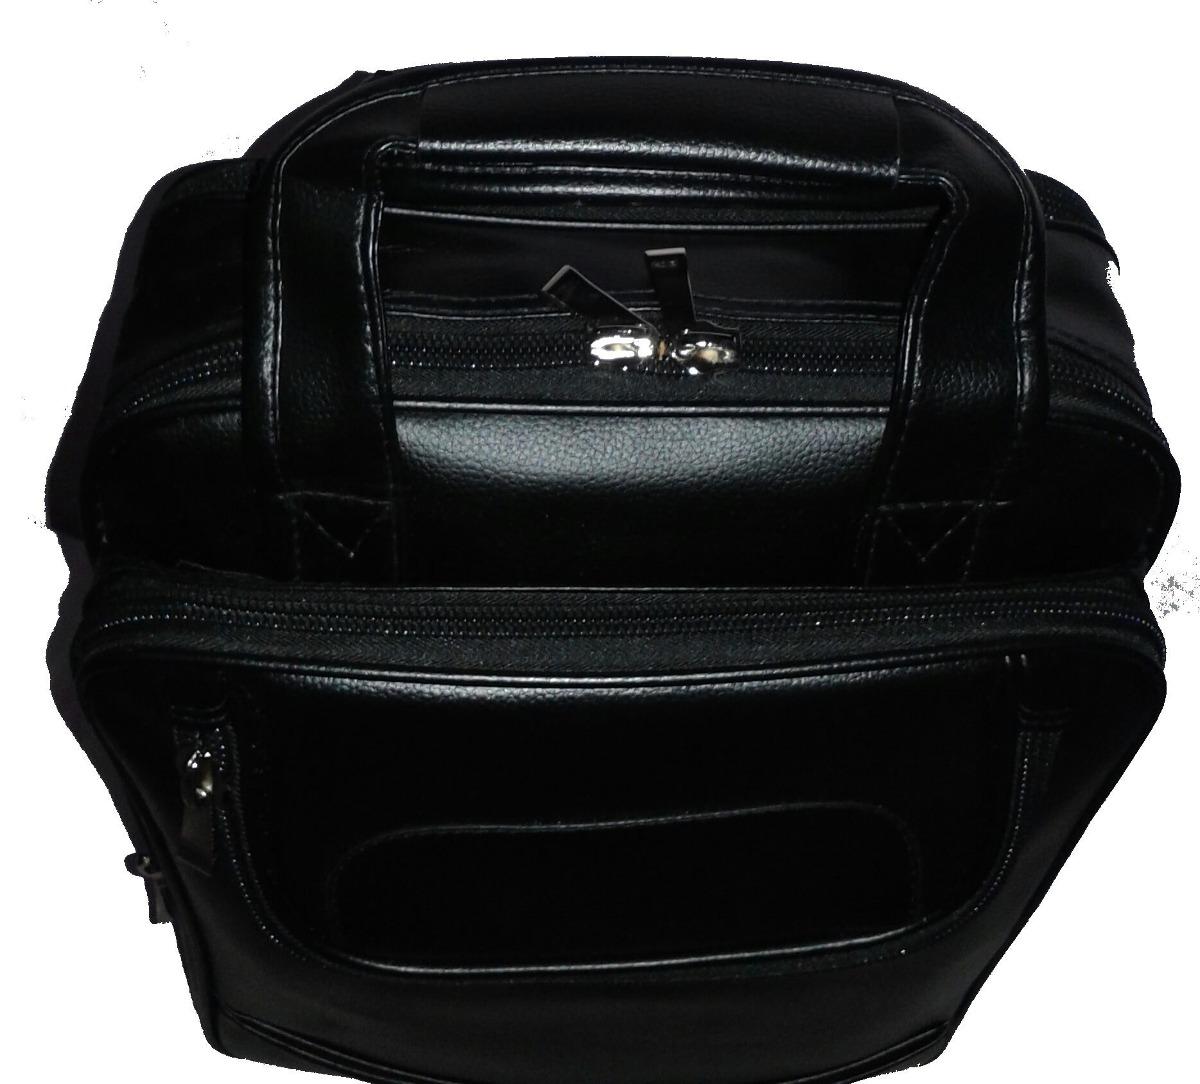 Bolsa Em Couro Masculina : Mochila notebook bolsa mala masculina em couro r